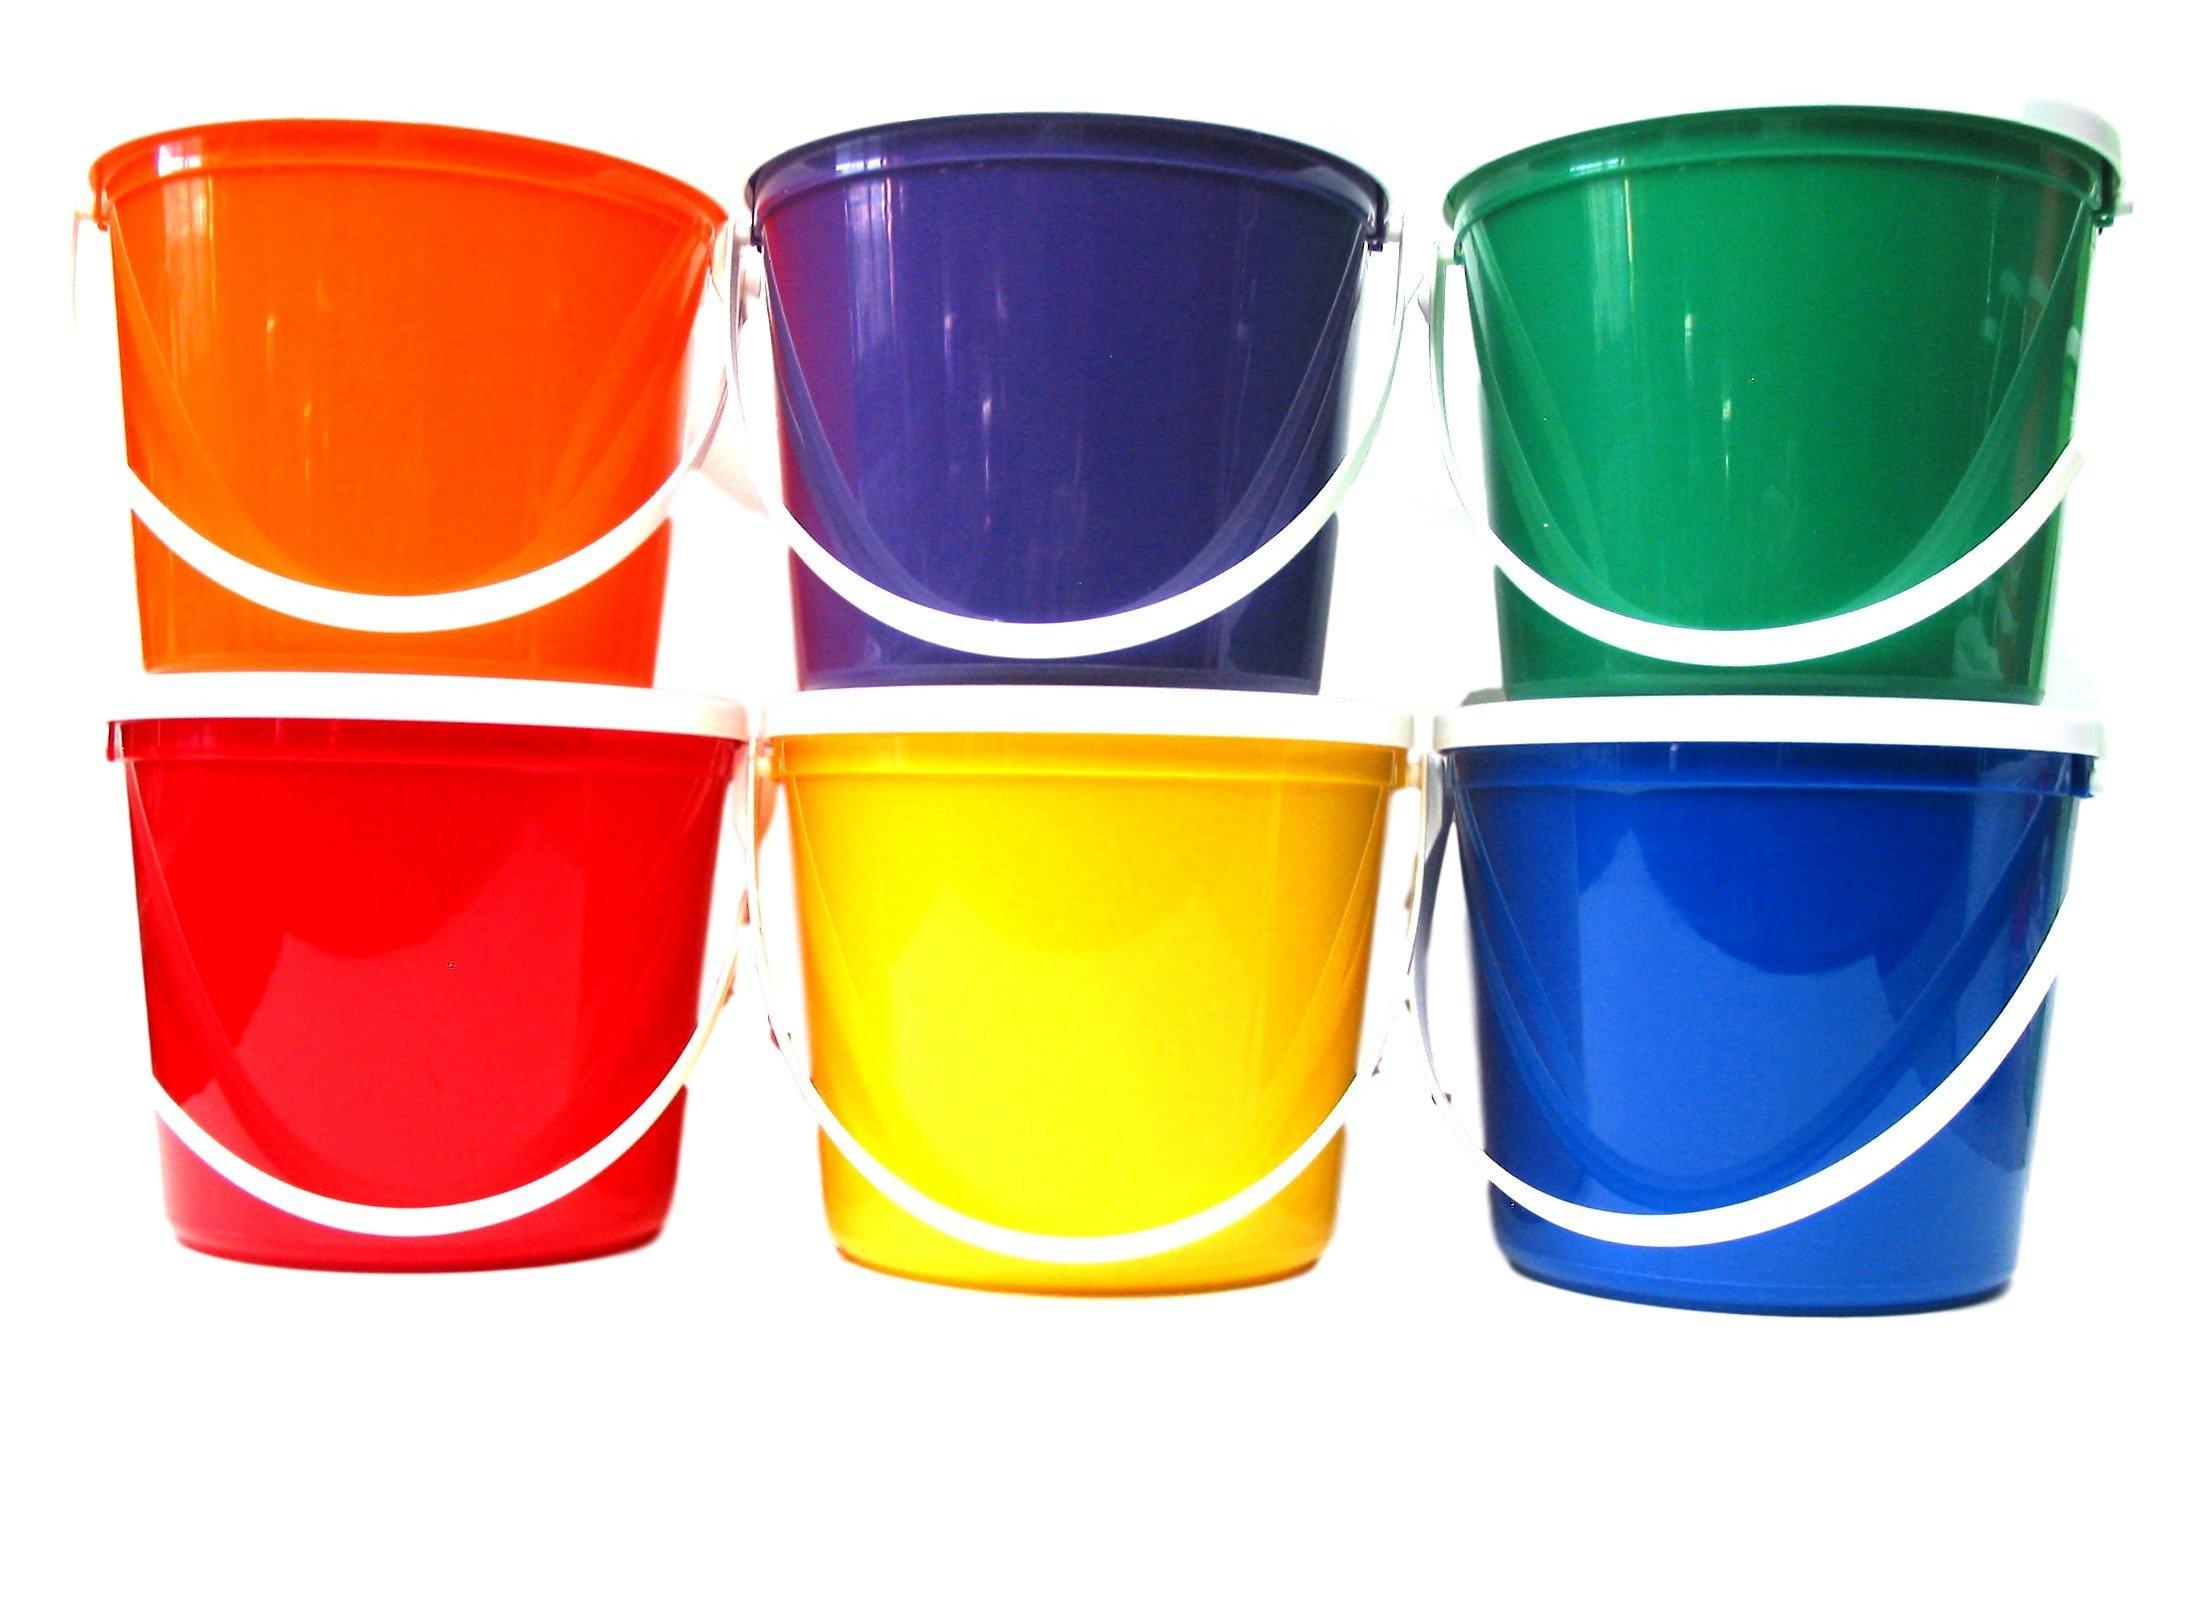 Plastic Buckets & Lids, 80 Ounces, 6 Pack,1 each Red Blue Yellow Orange Purple & Green by Talisman (Image #1)